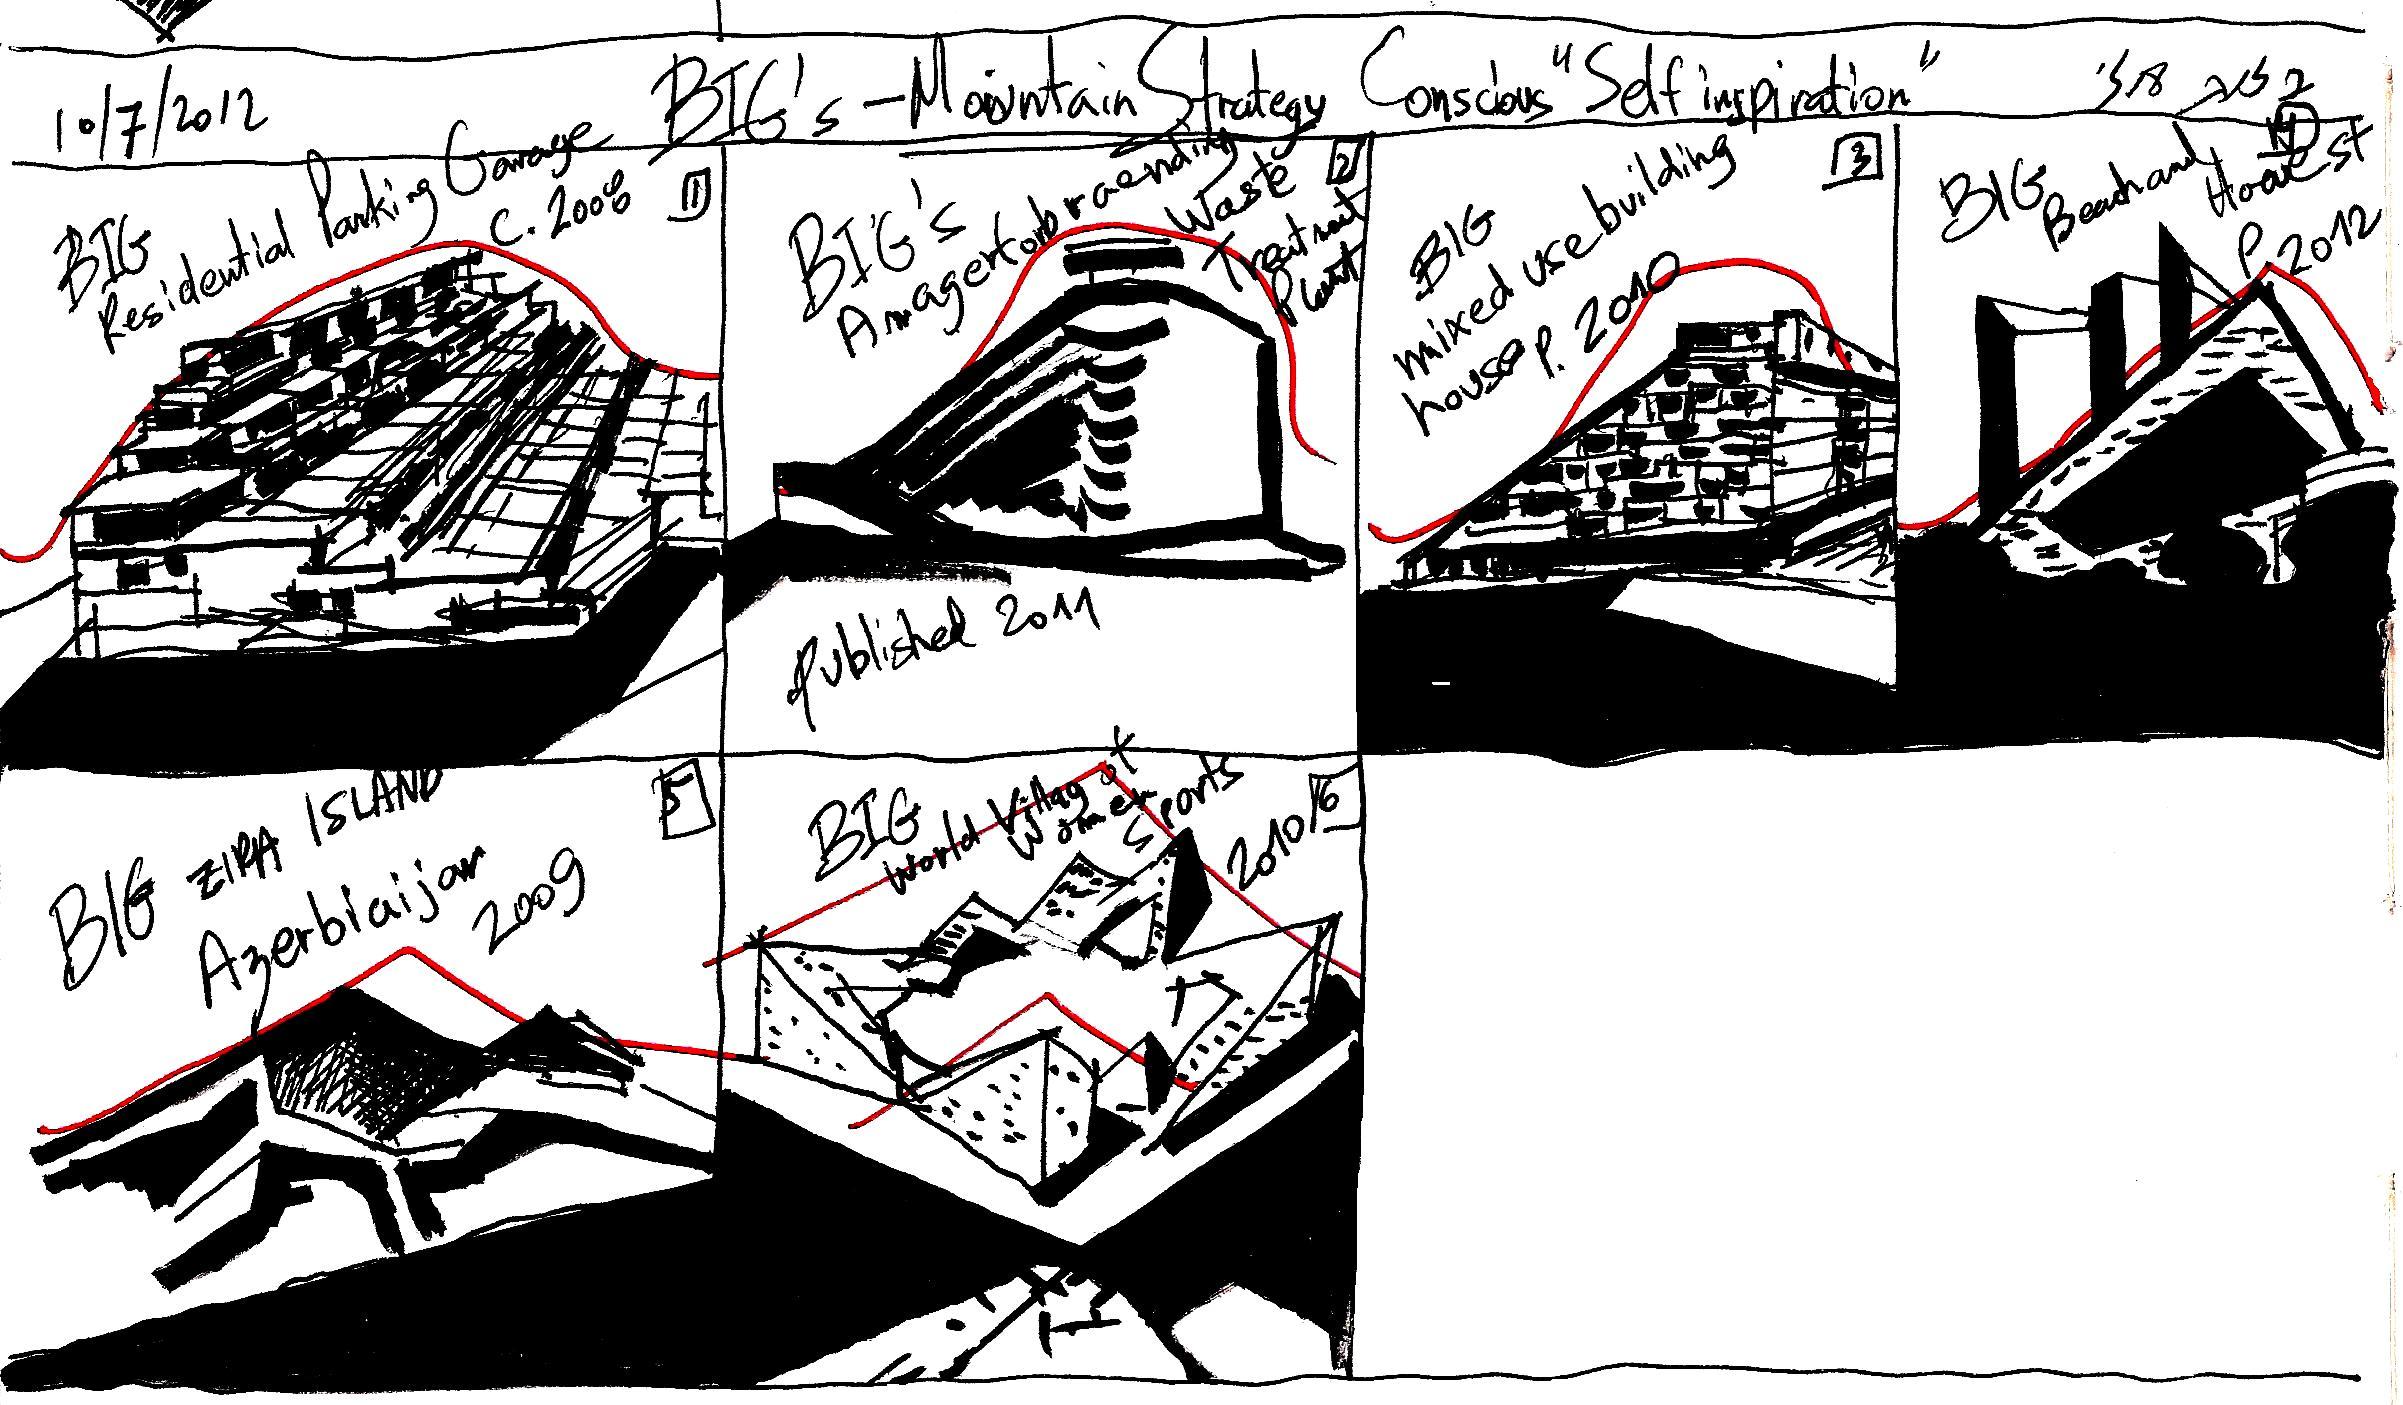 big bjarke ingels s group mountain strategy or the. Black Bedroom Furniture Sets. Home Design Ideas